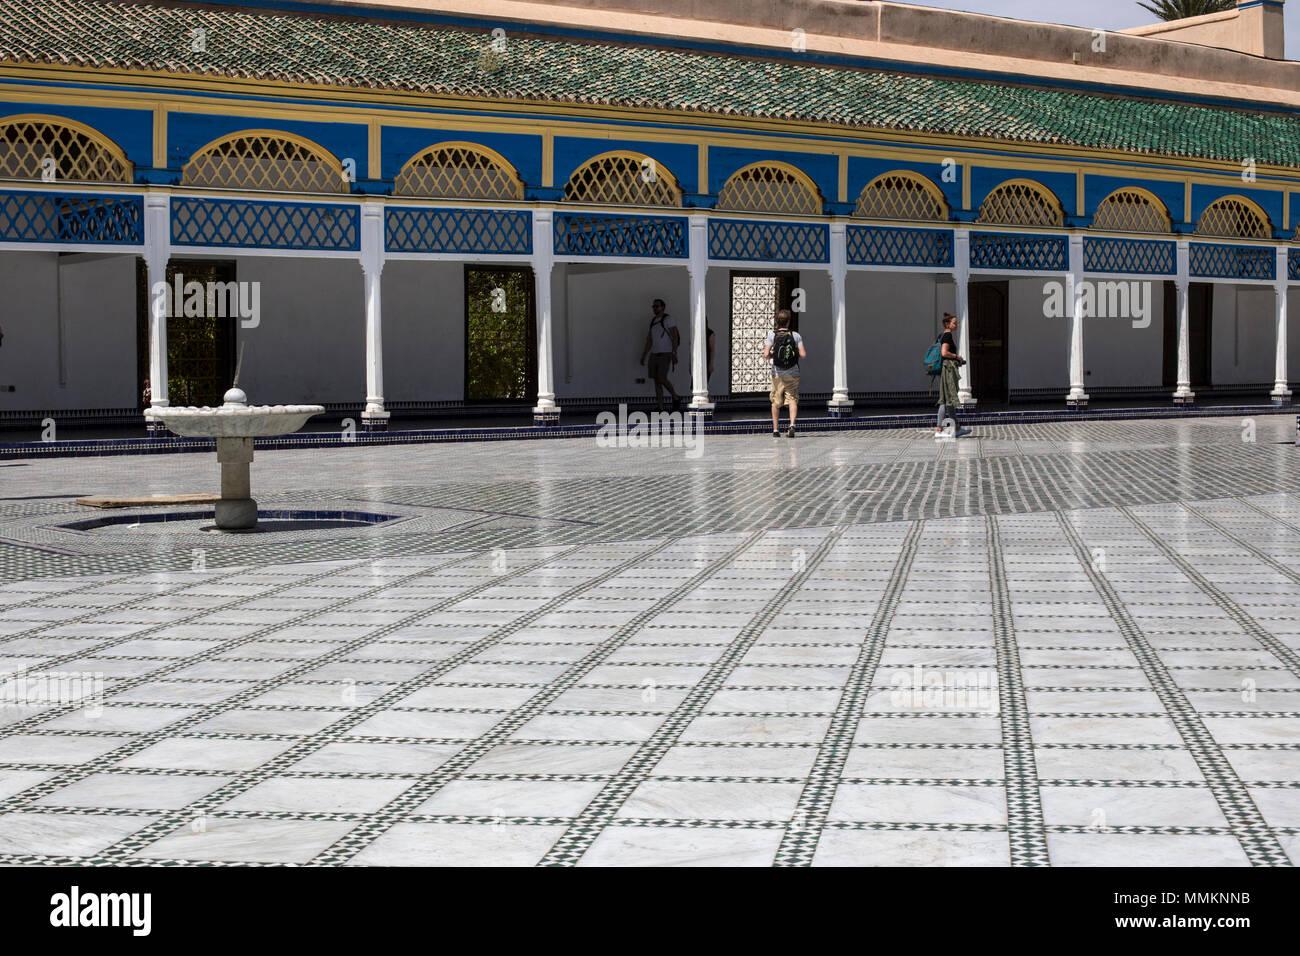 Bahia Palace Marrakesh - Stock Image